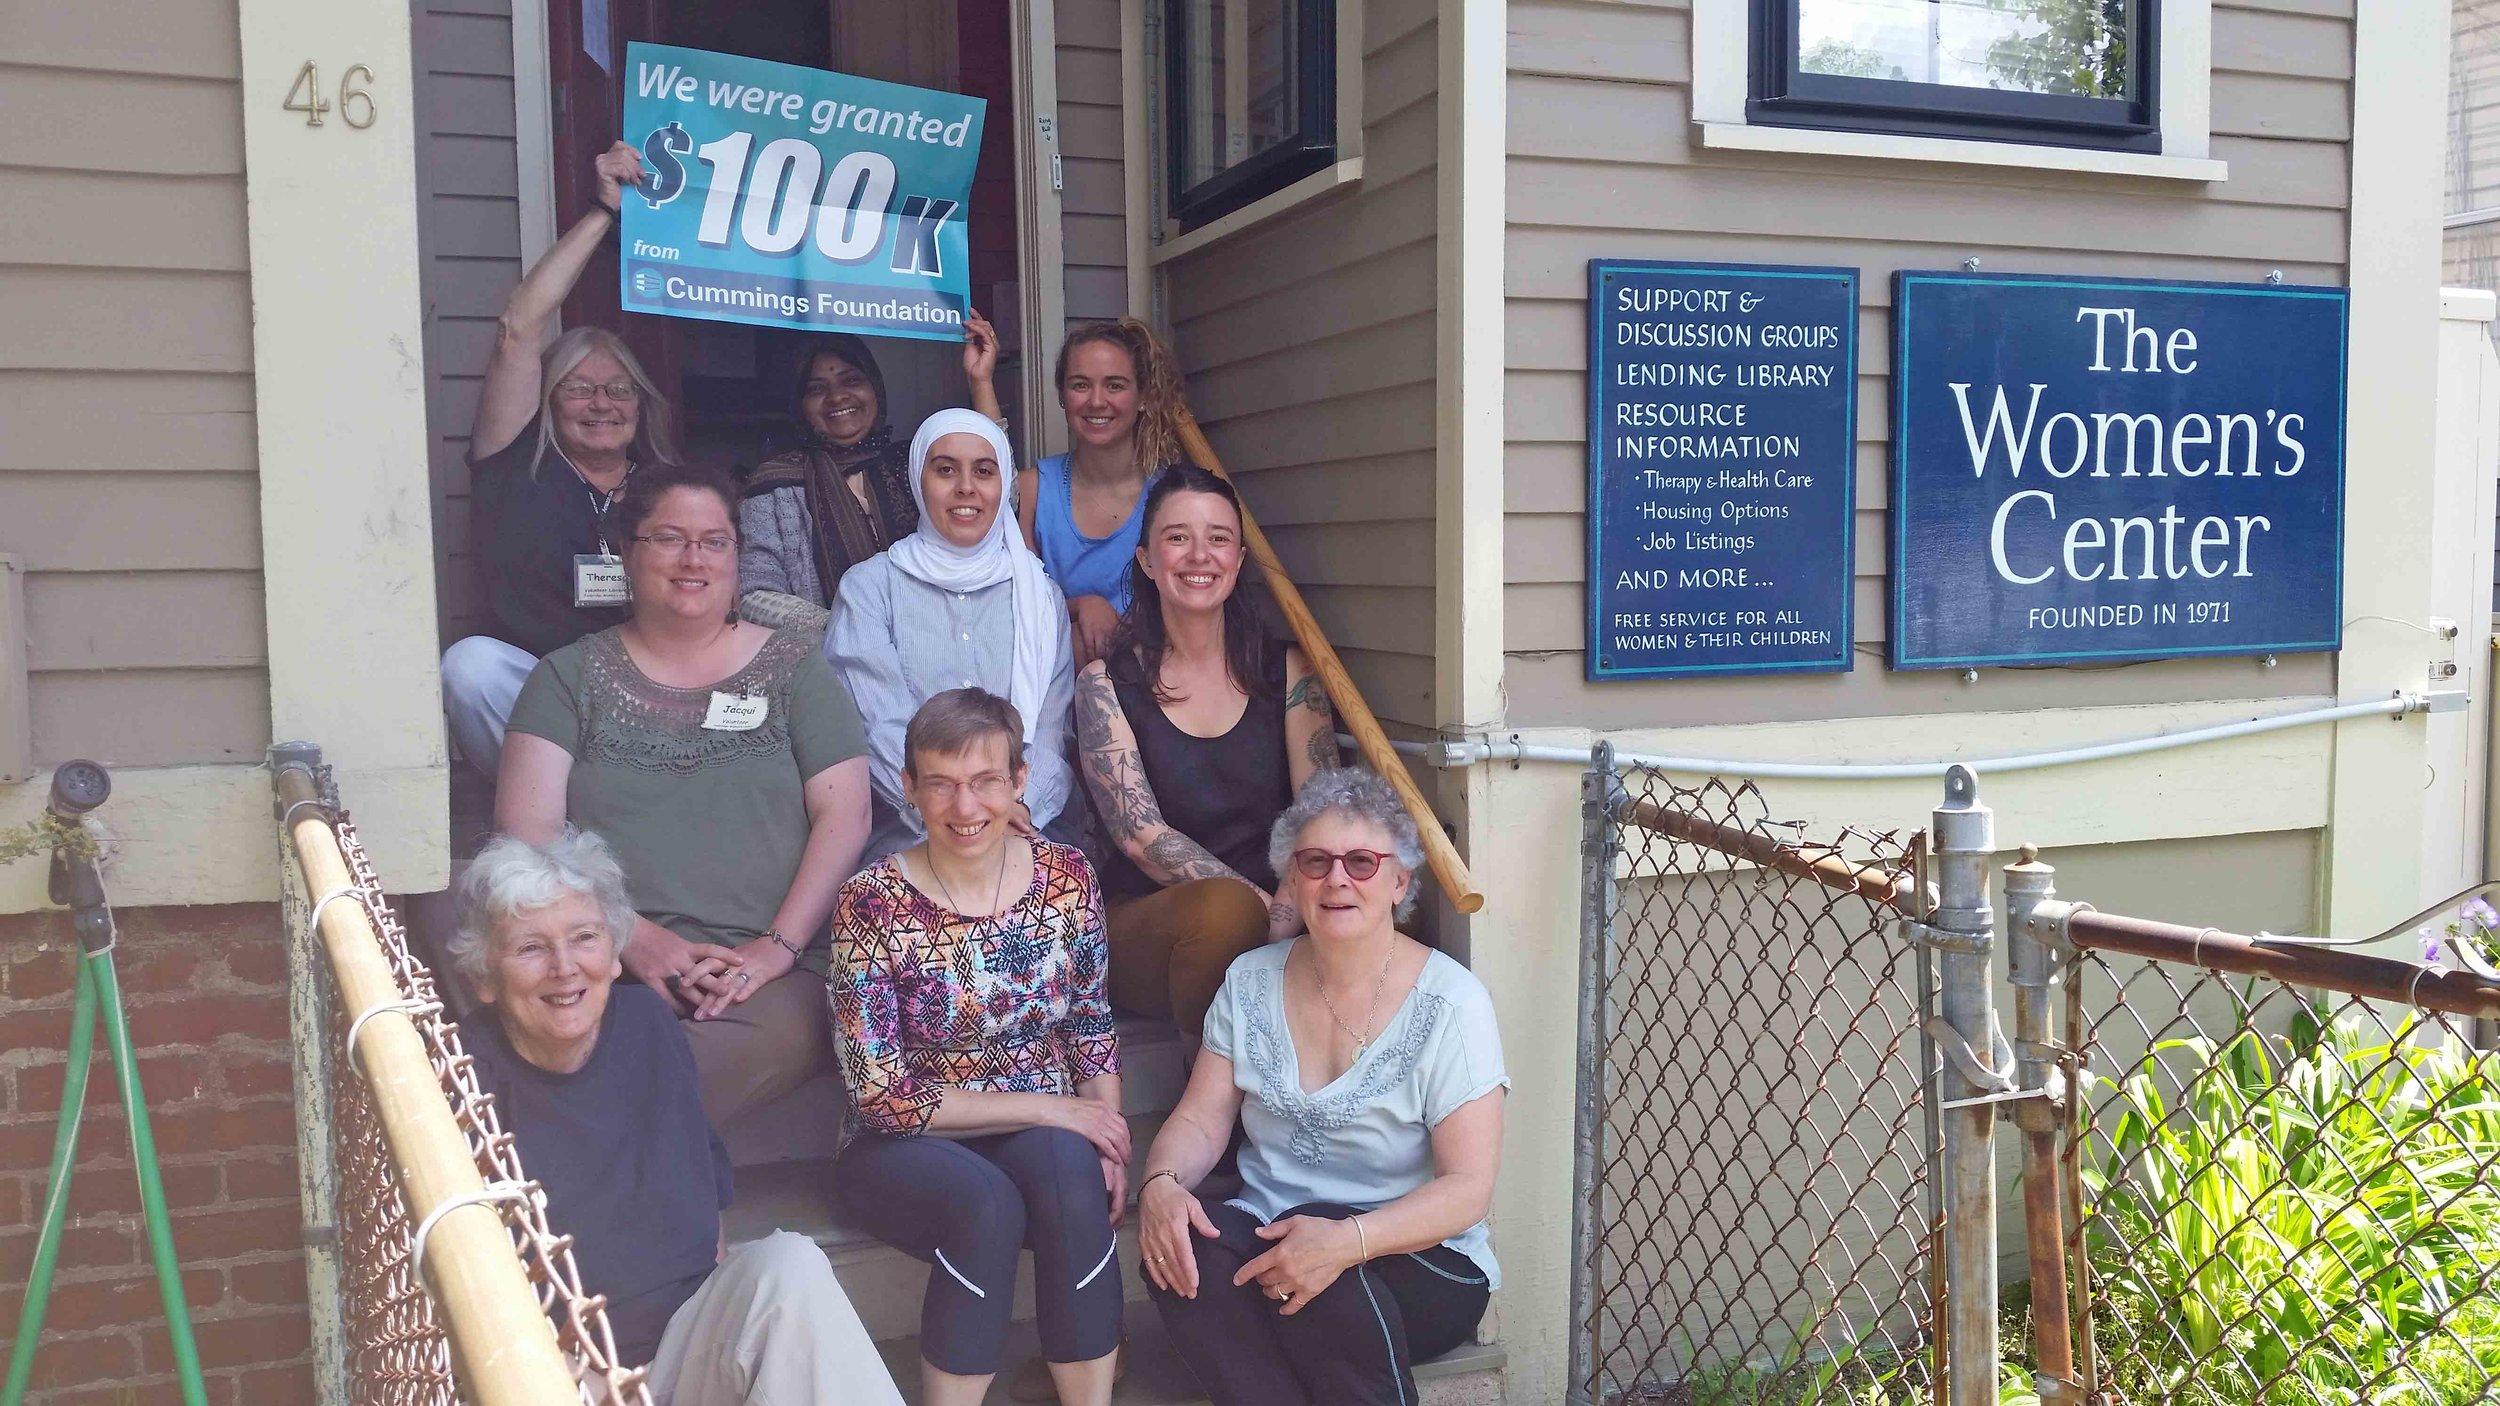 Women's Center members celebrate our Cummings Foundation award.